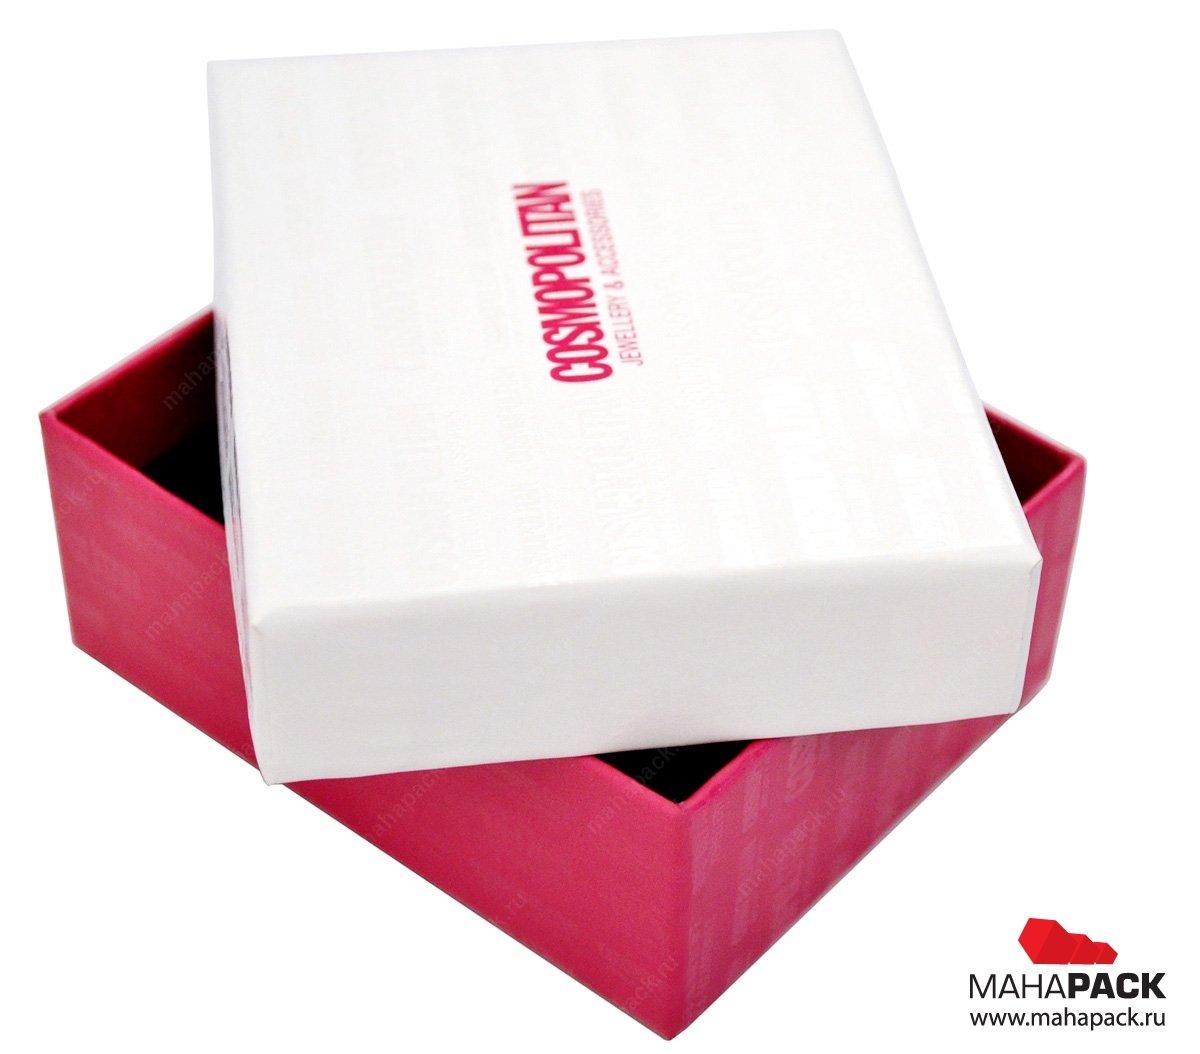 Картонная коробка для бижутерии